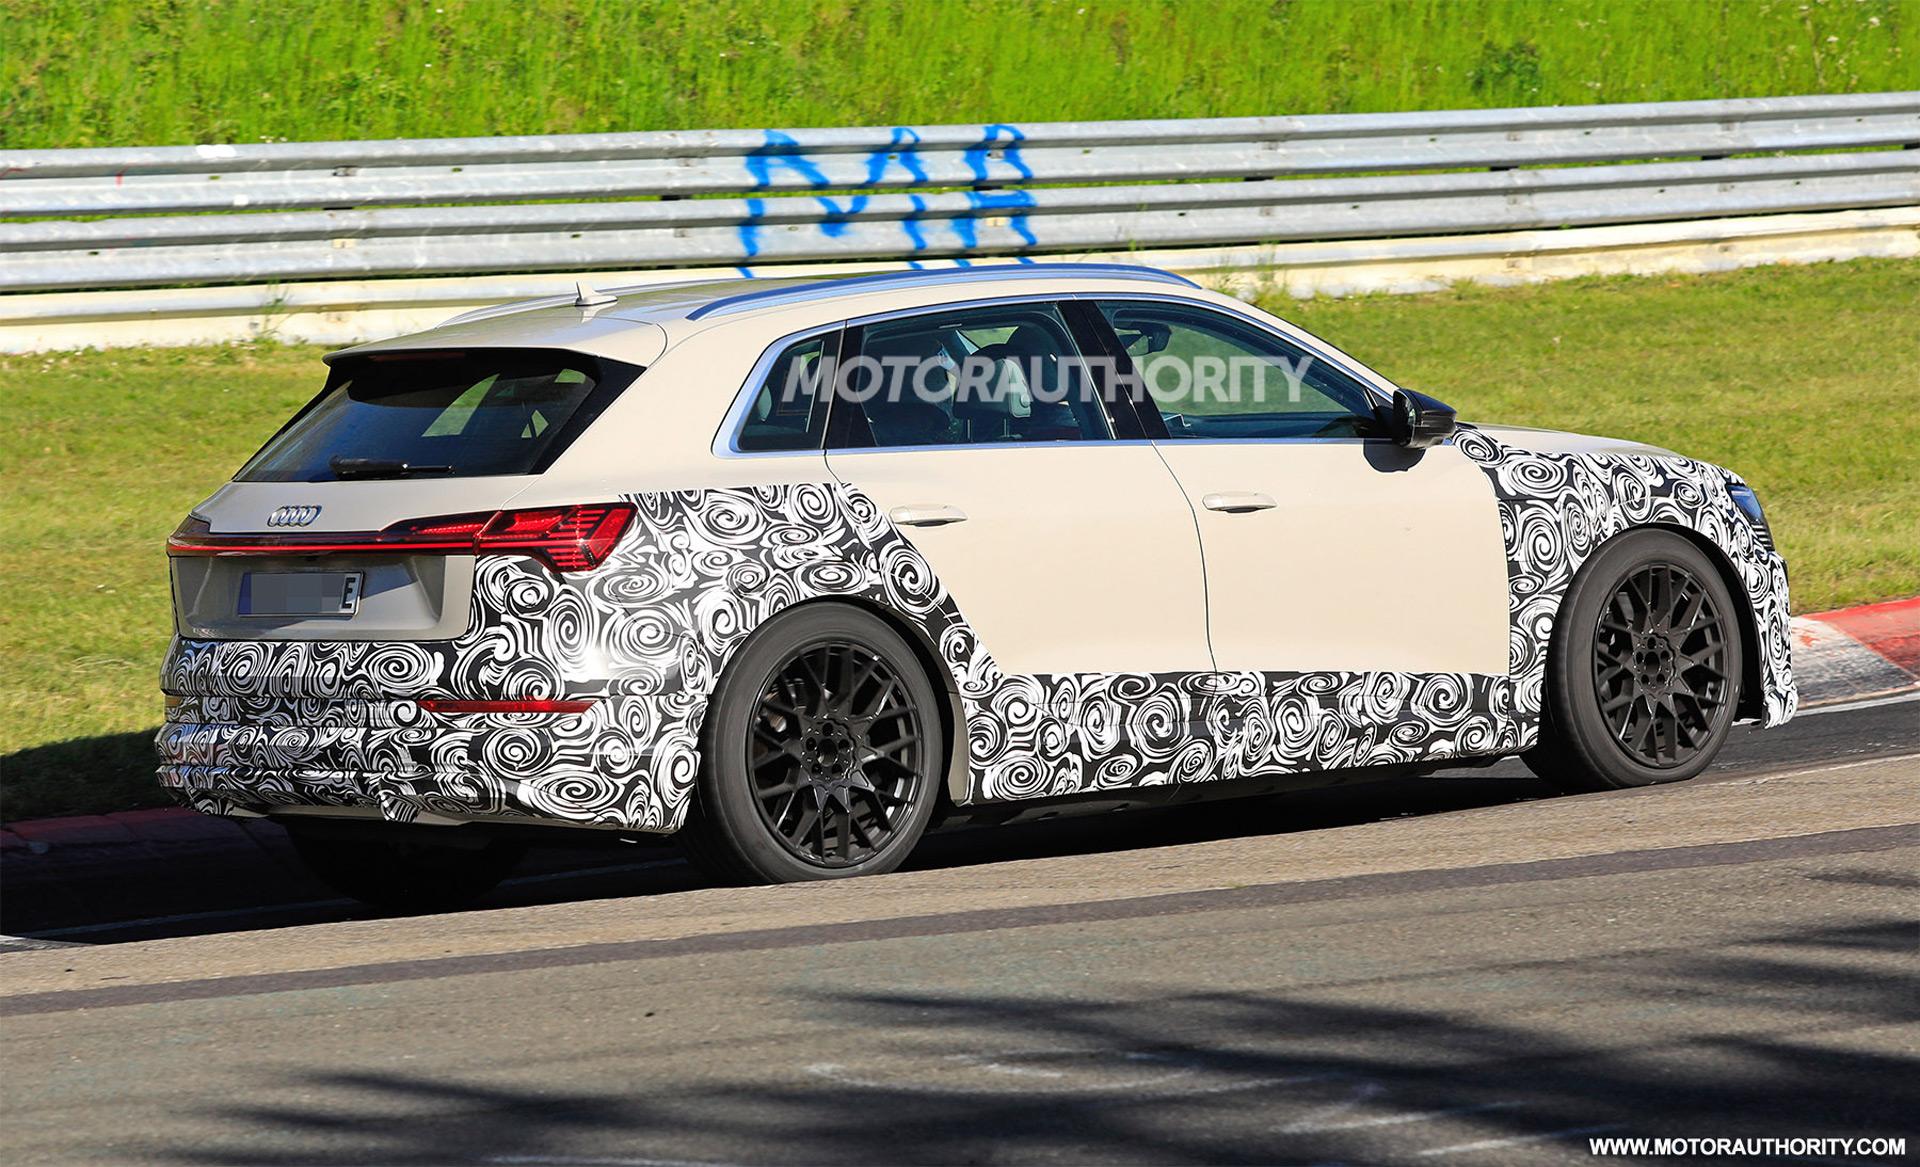 2018 [Audi] E-Tron Quattro - Page 7 2020-audi-e-tron-s-spy-shots--image-via-s-baldauf-sb-medien_100702358_h